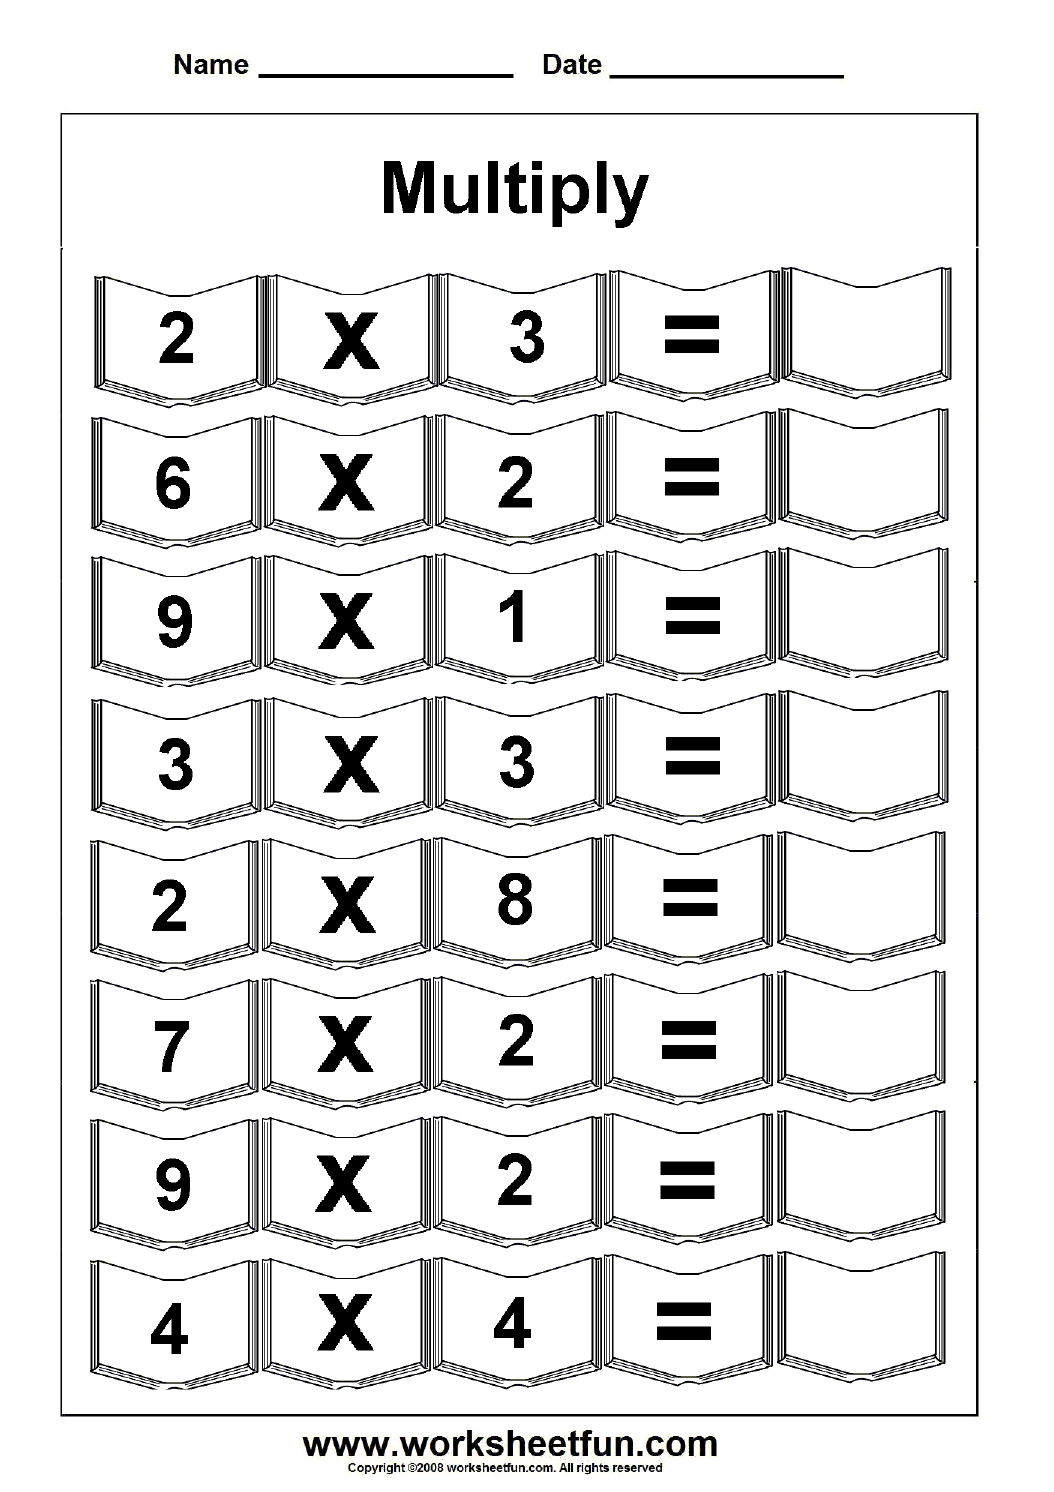 Multiplication – 5 Worksheets / Free Printable Worksheets – Worksheetfun - Free Printable Multiplication Sheets